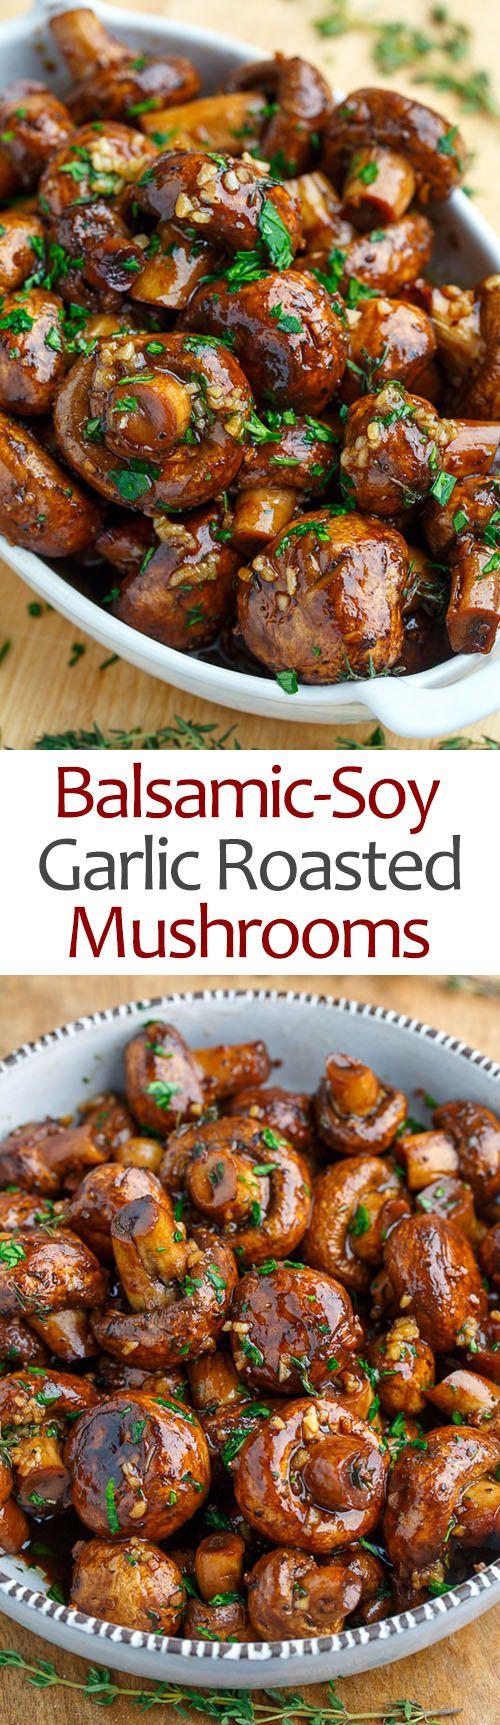 Balsamic Soy Roasted Garlic Mushrooms.